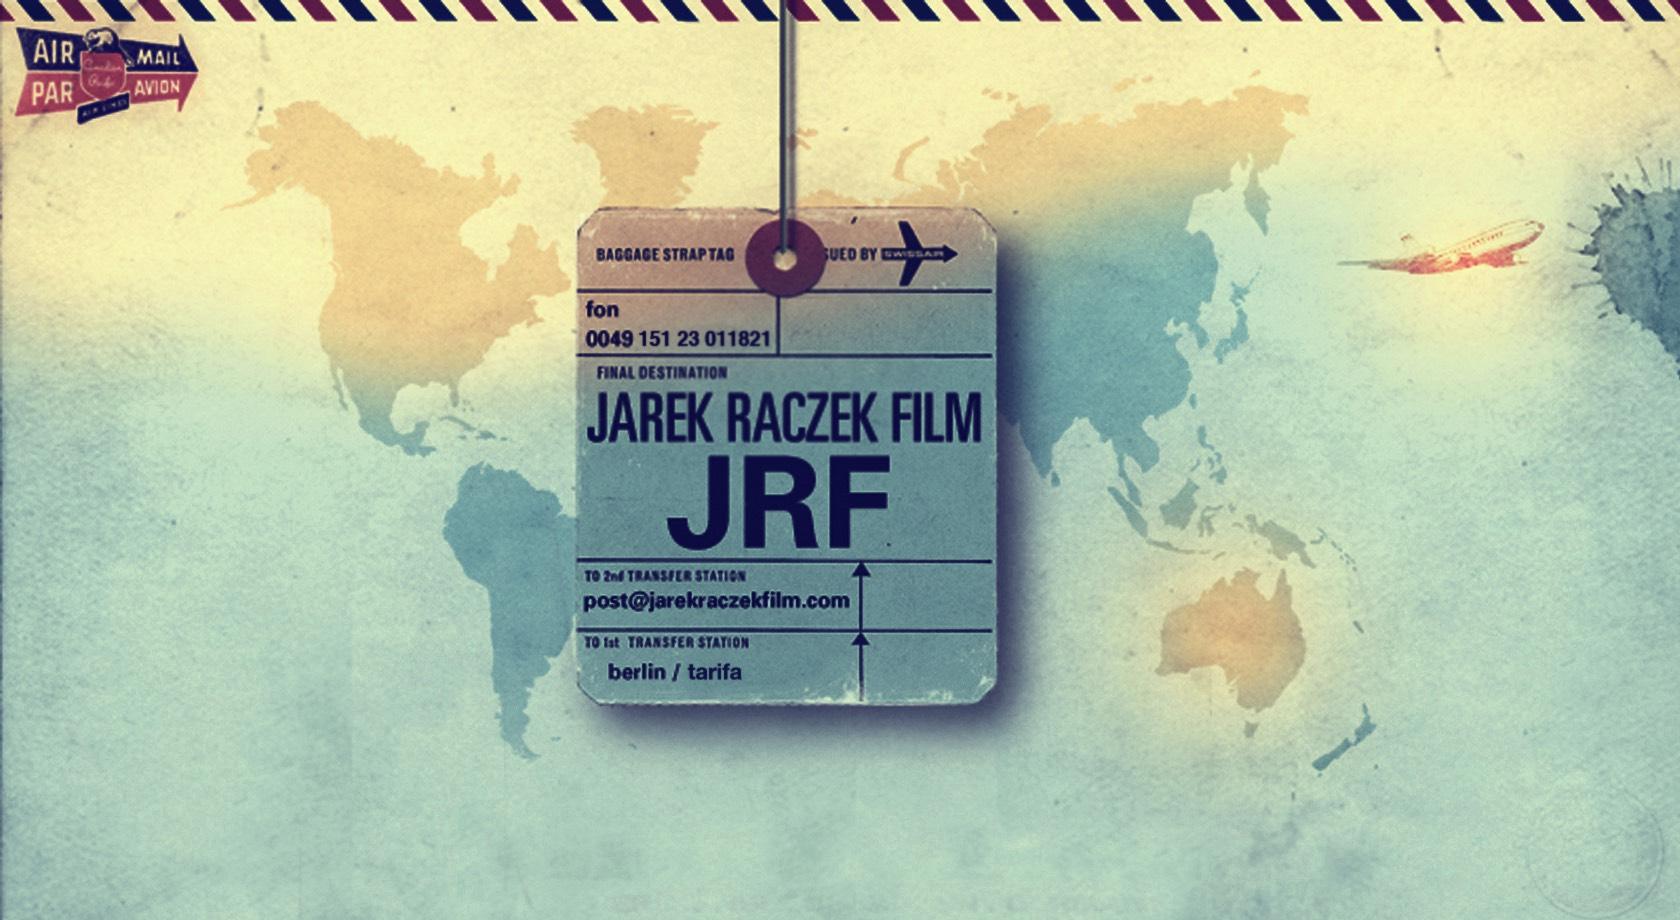 Kontakt_JRF_JAREK_RACZEK_V3_berlin_tarifa_2018